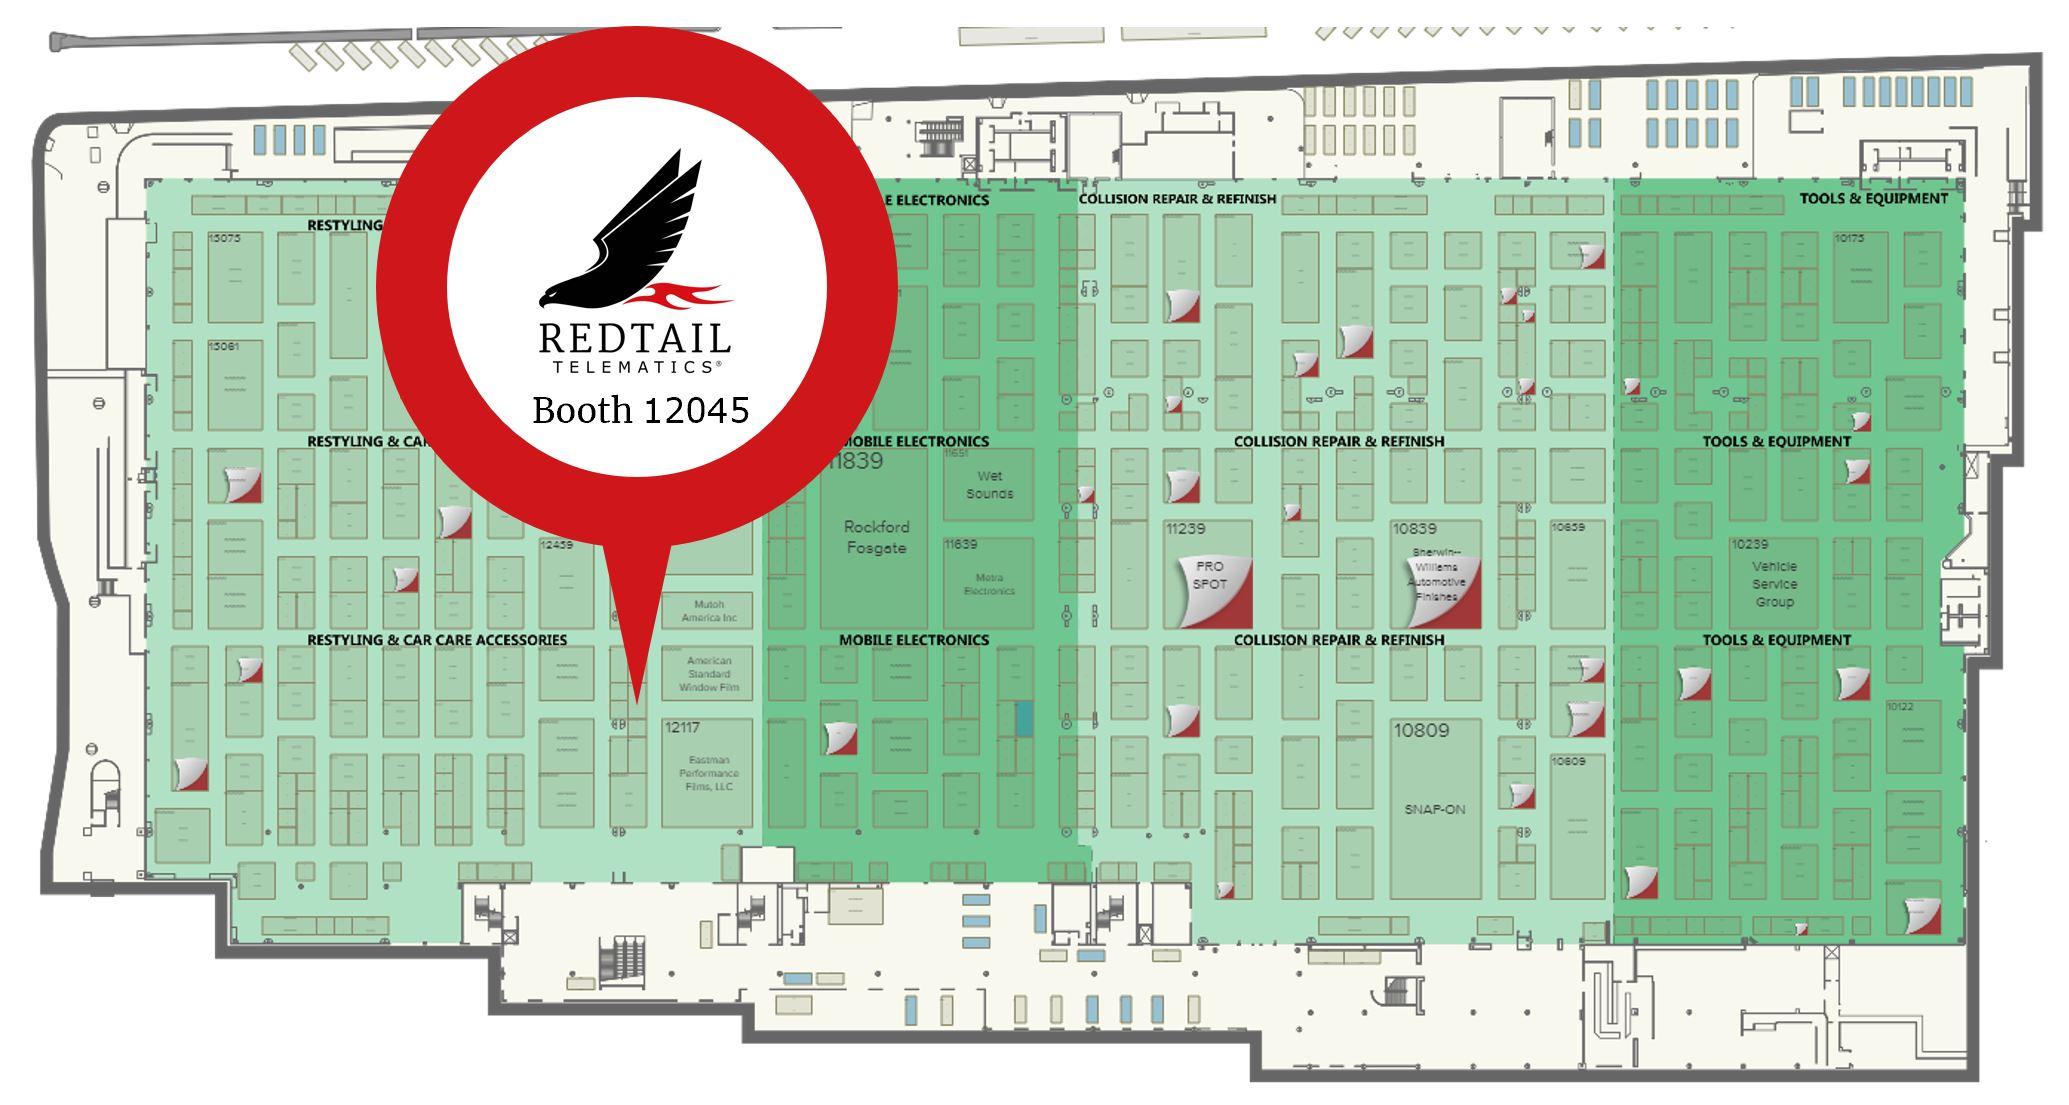 SEMA 2019 Redtail Telematics booth 12045